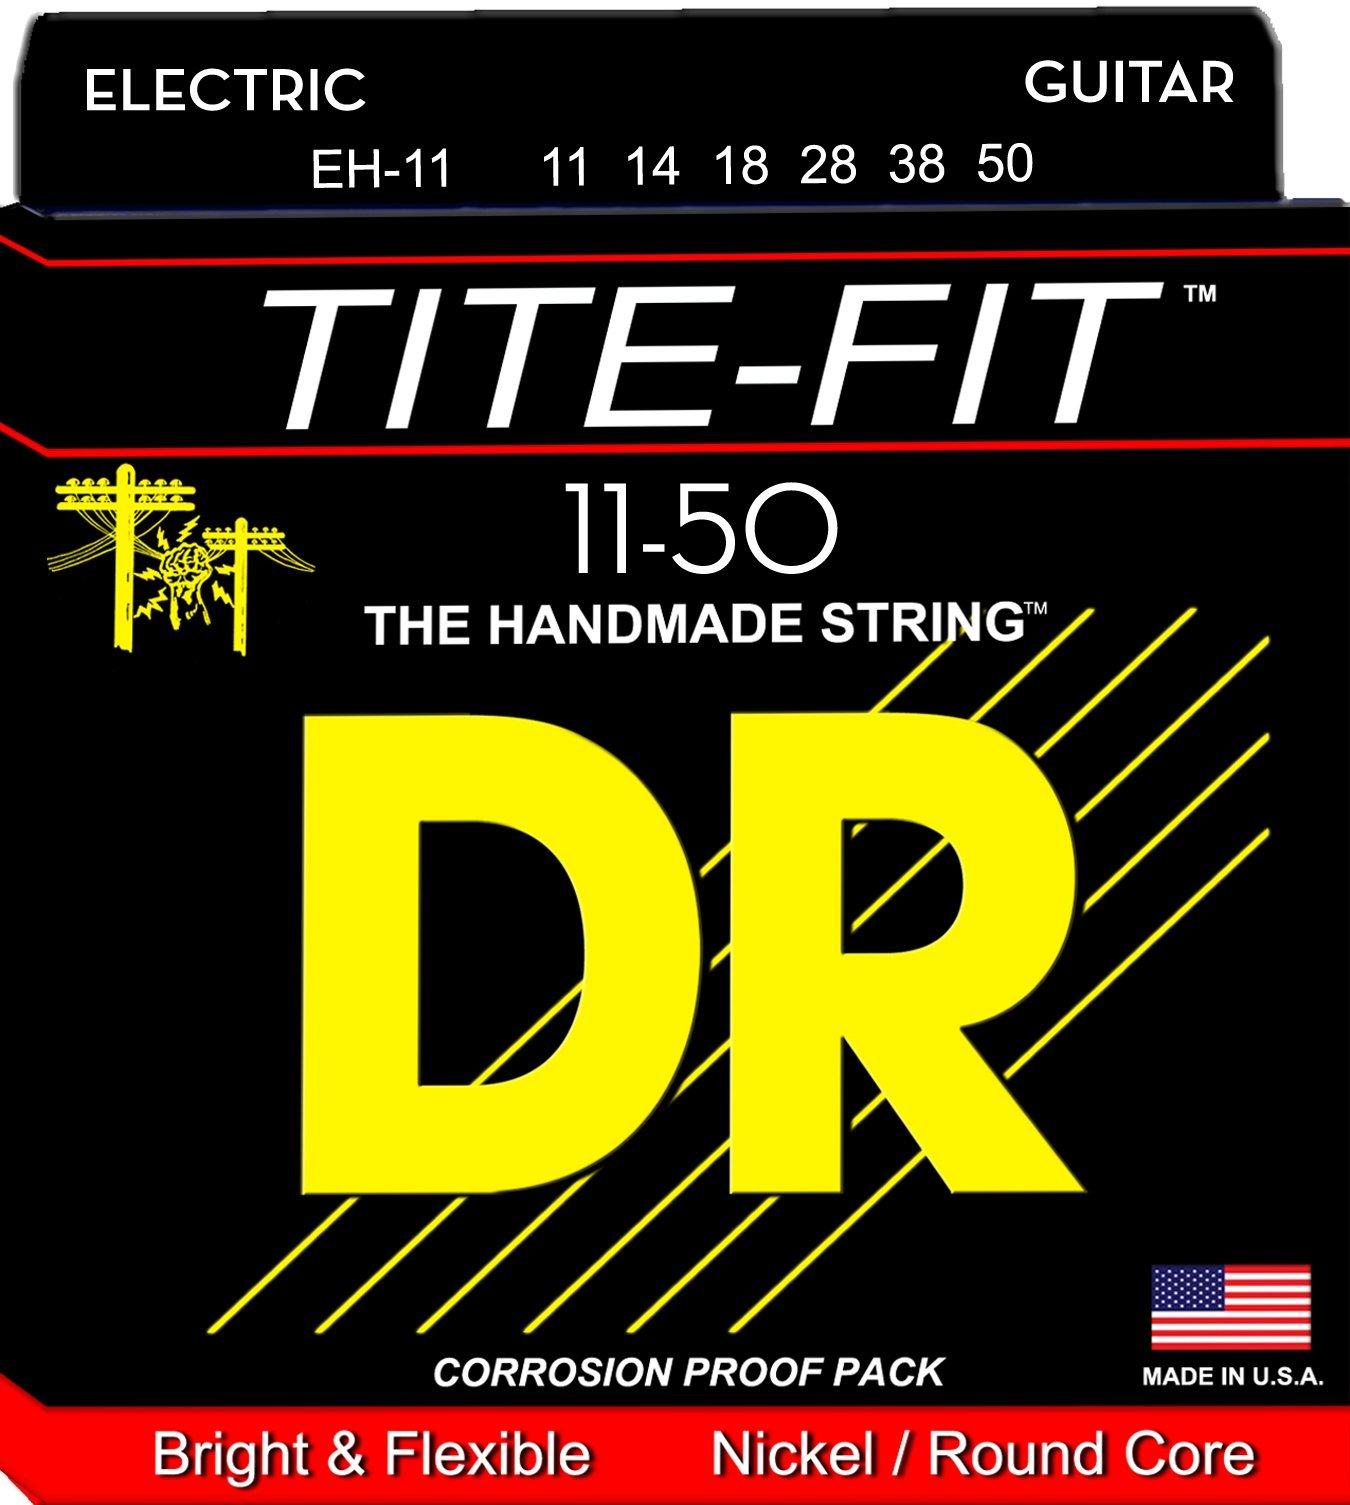 DR Strings EH11 Tite-Fit Electric Guitar Strings 11-50